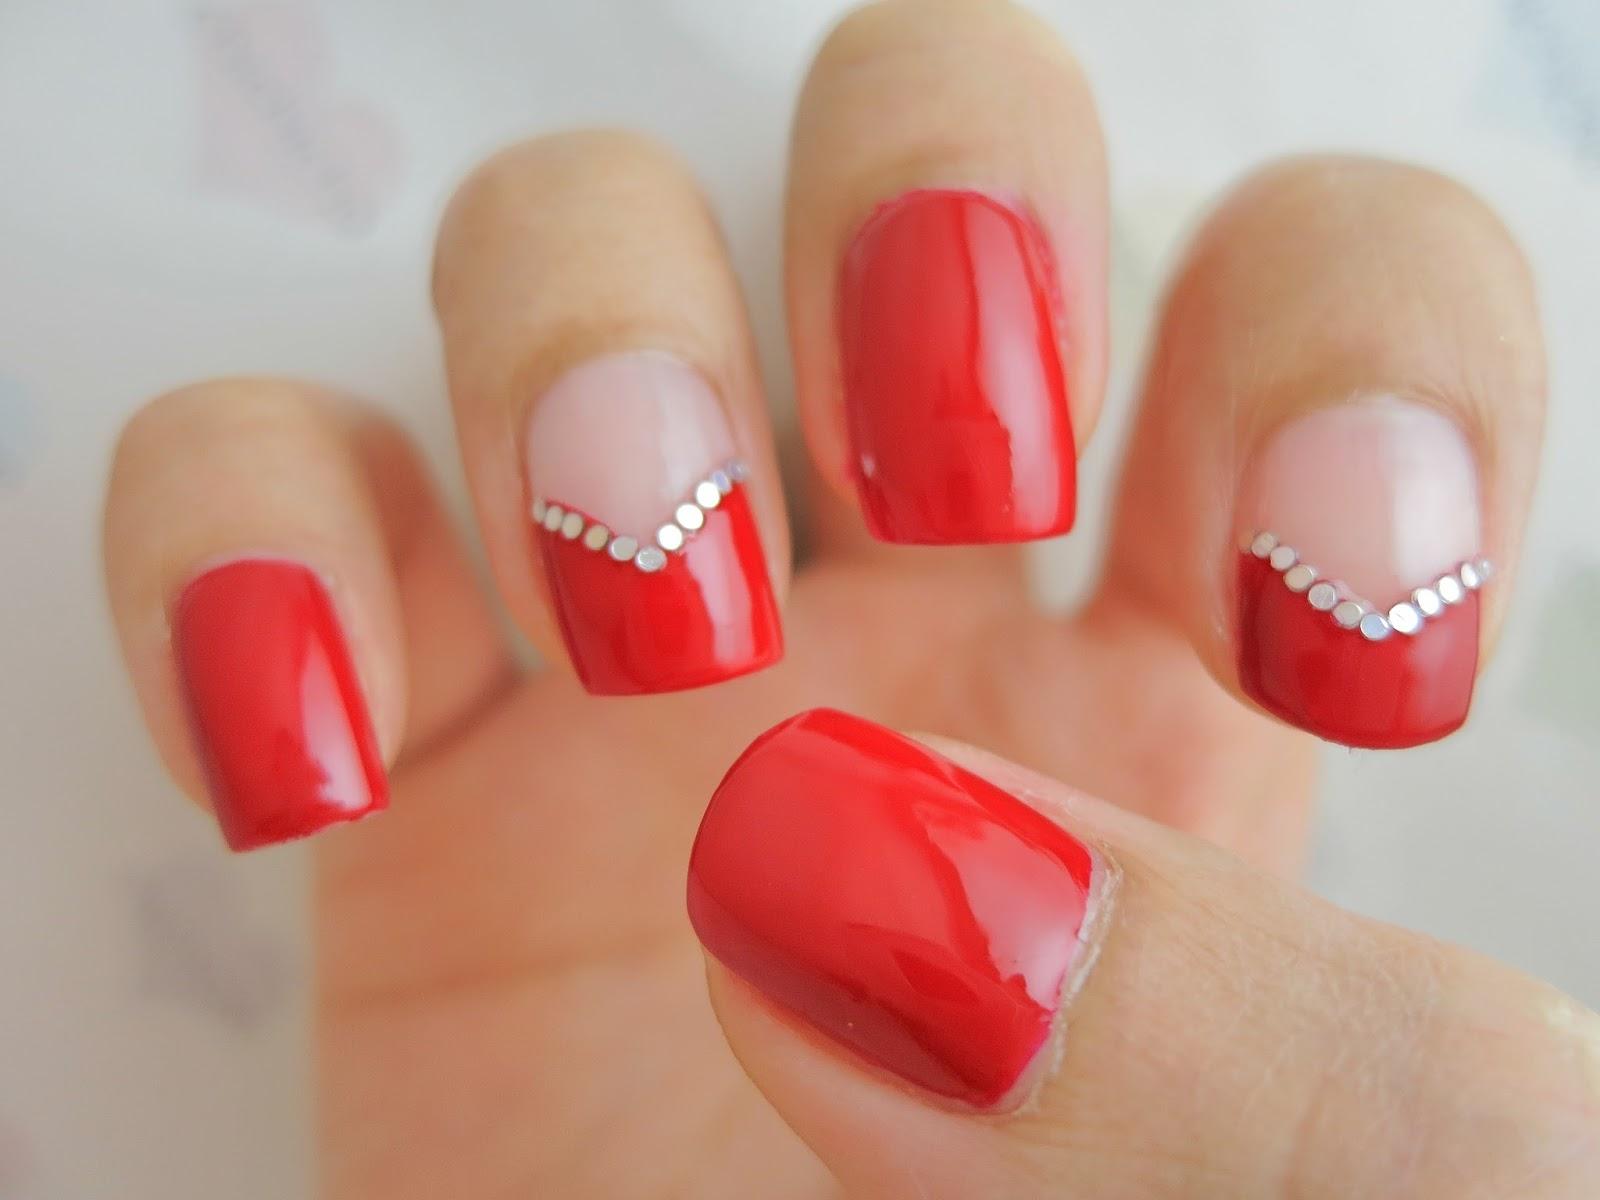 ONL DD Pop Nails #21 Swatch Nail Art - chichicho~